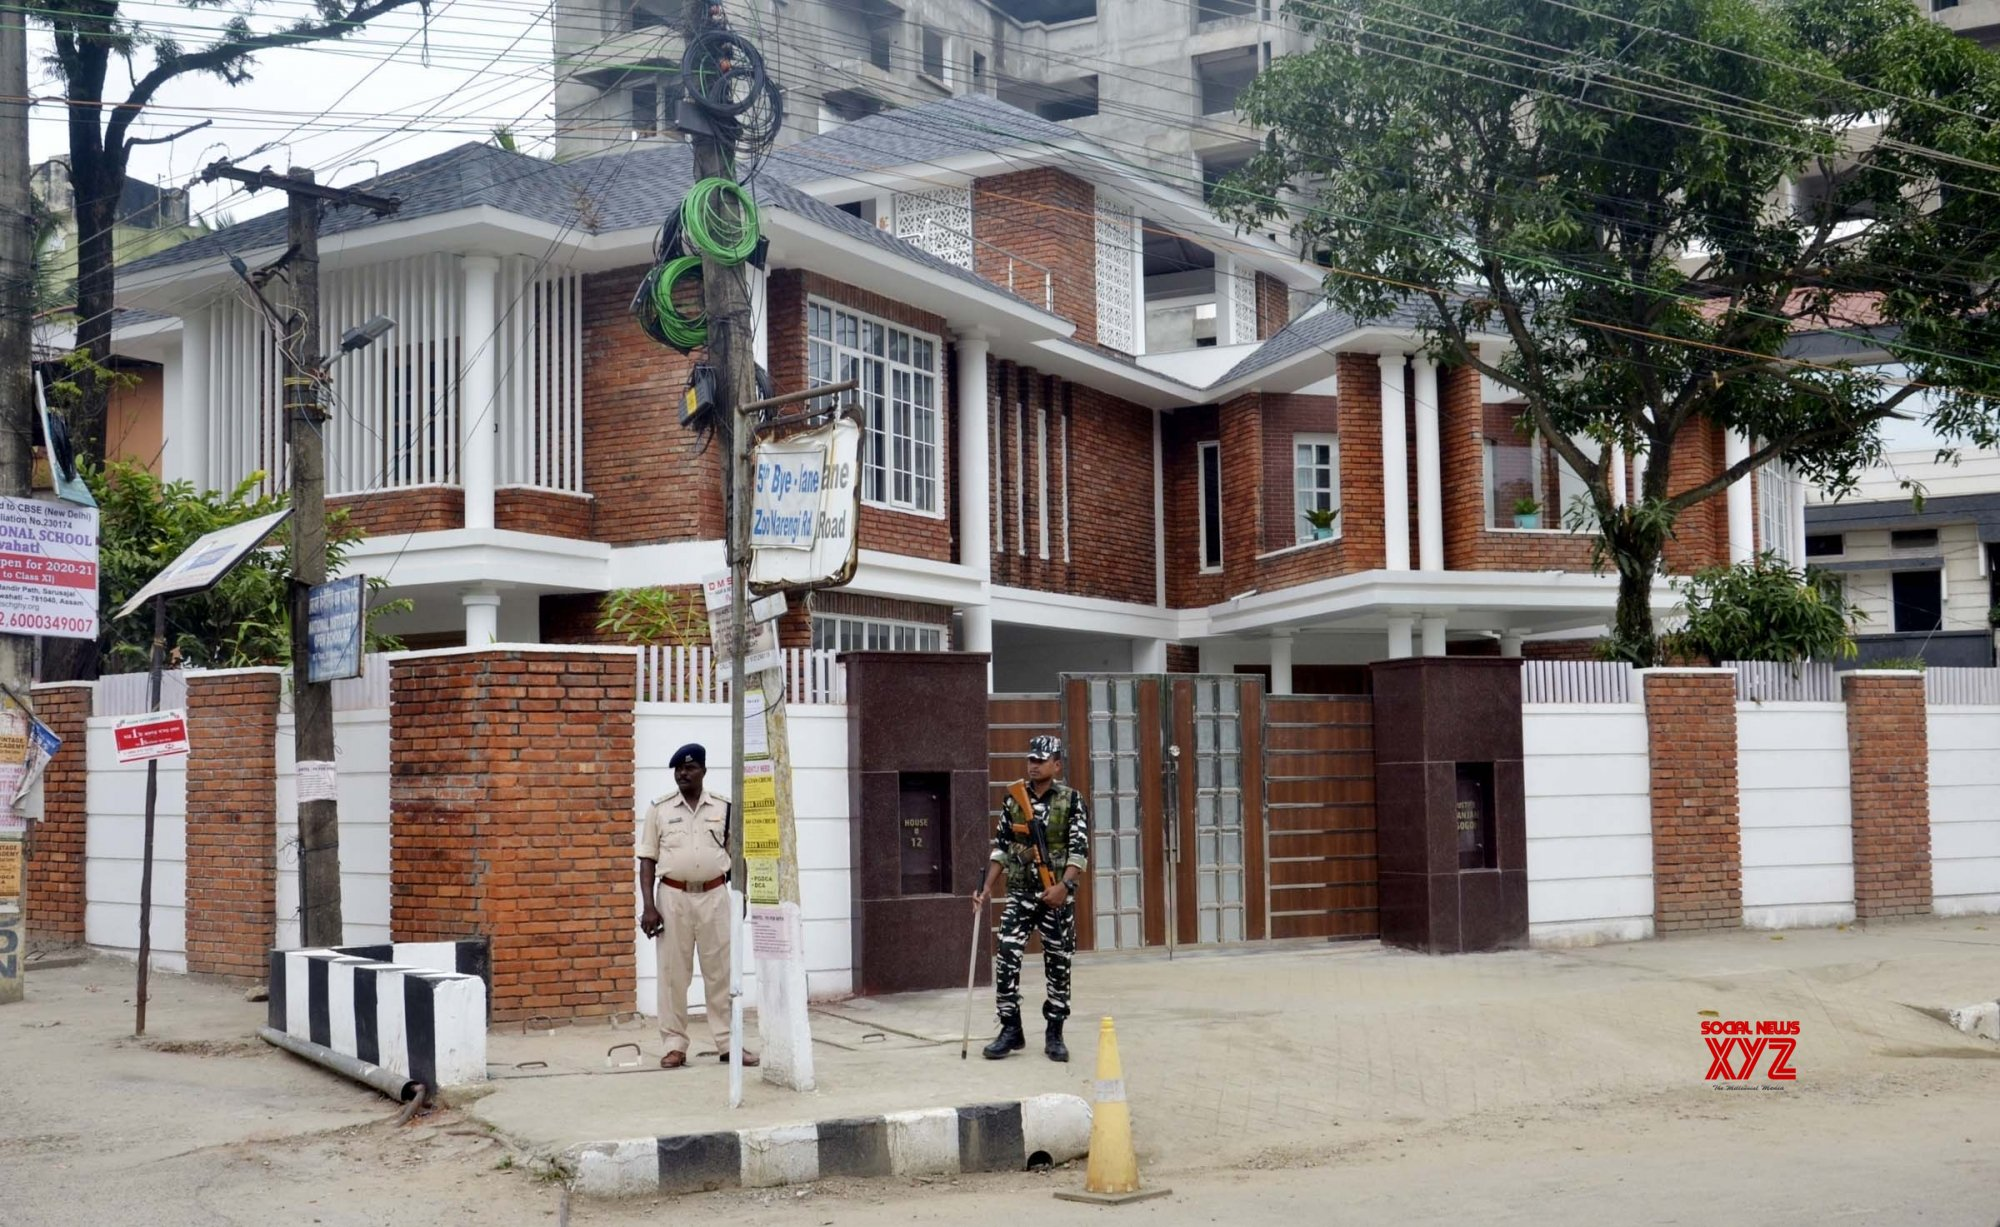 Guwahati: Tight security outside CJI Ranjan Gogoi's residence in Assam #Gallery